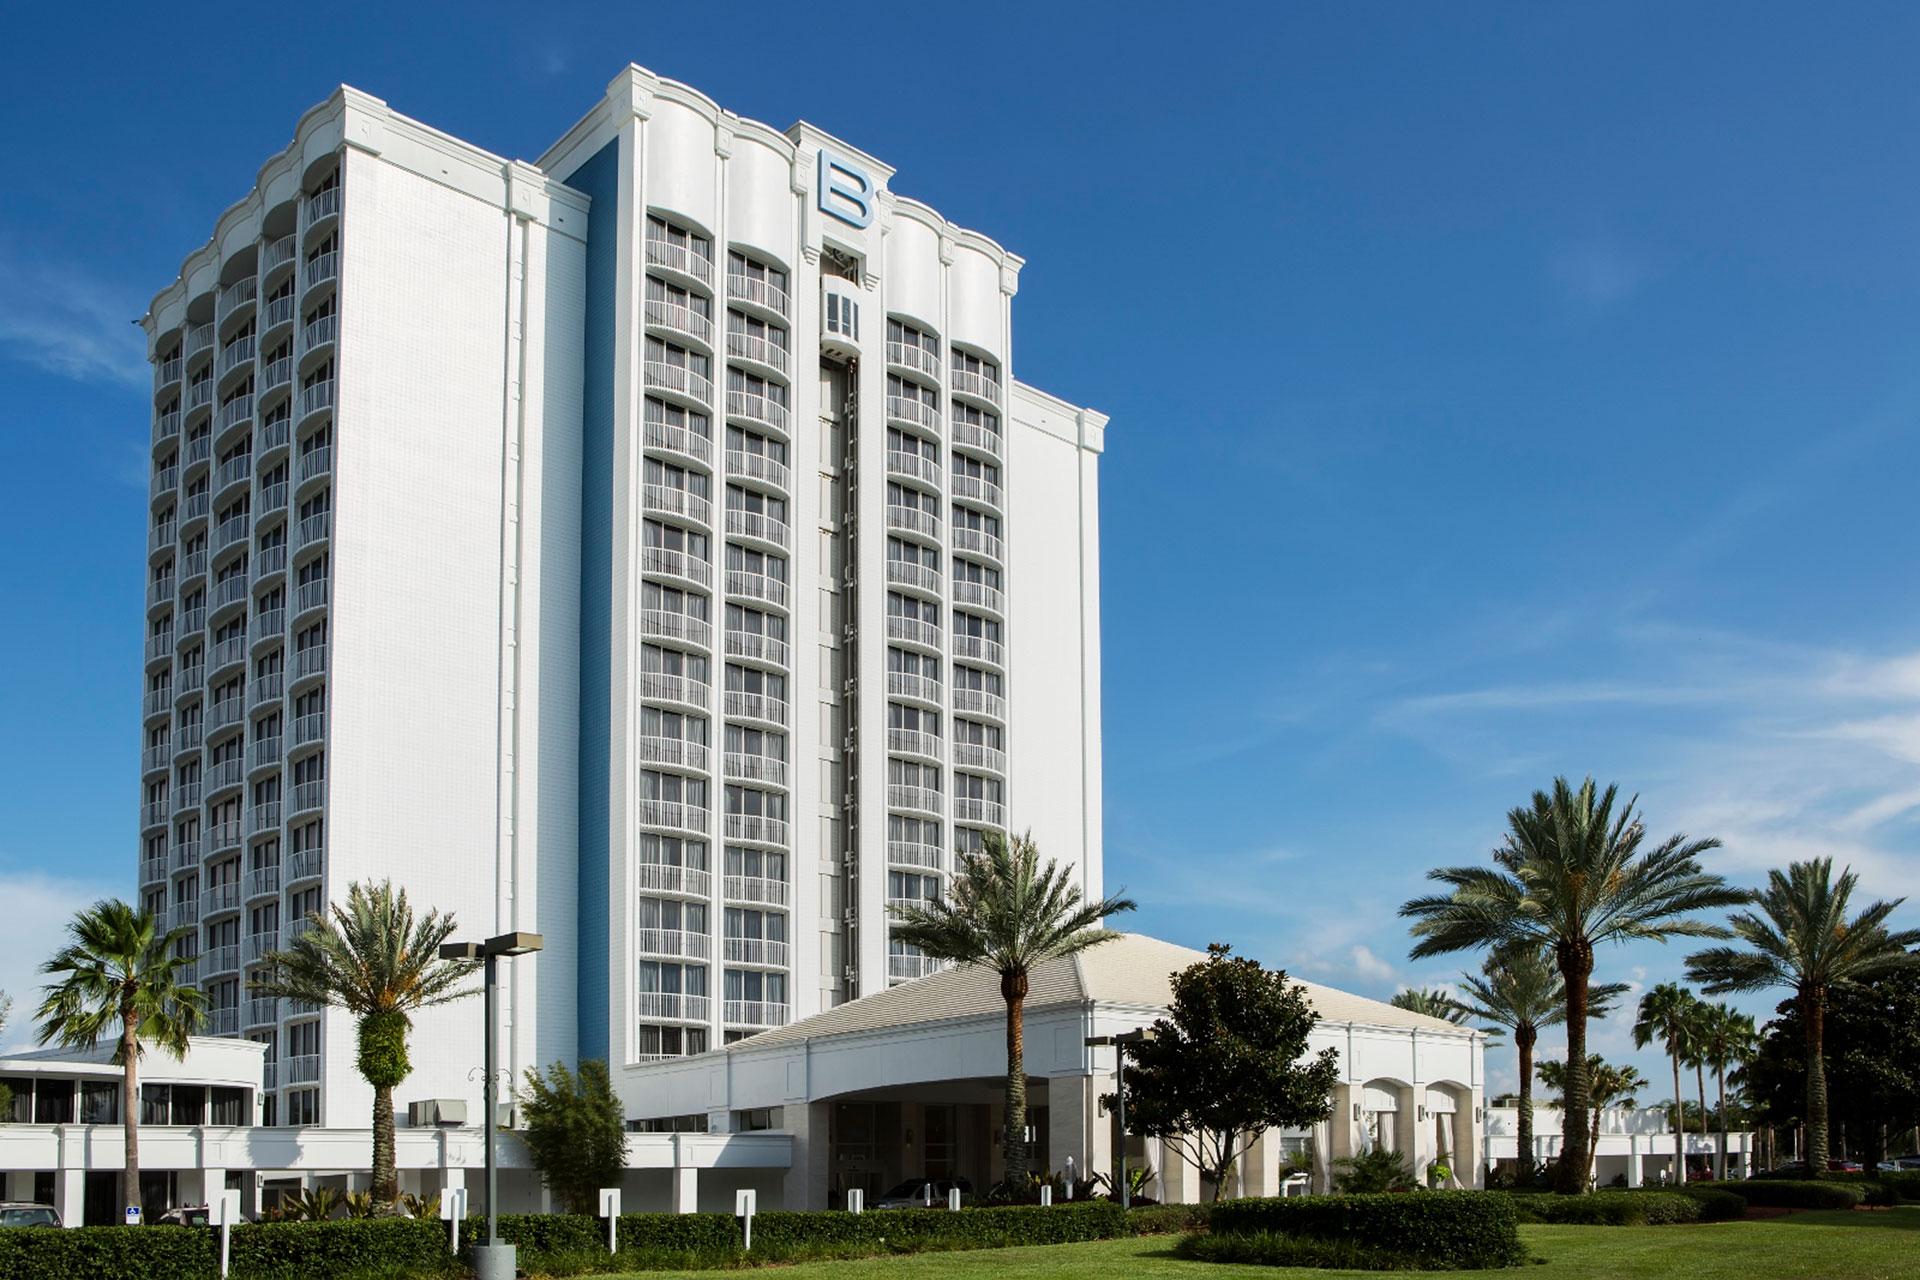 B Resort & Spa in Orlando; Courtesy of B Resort & Spa